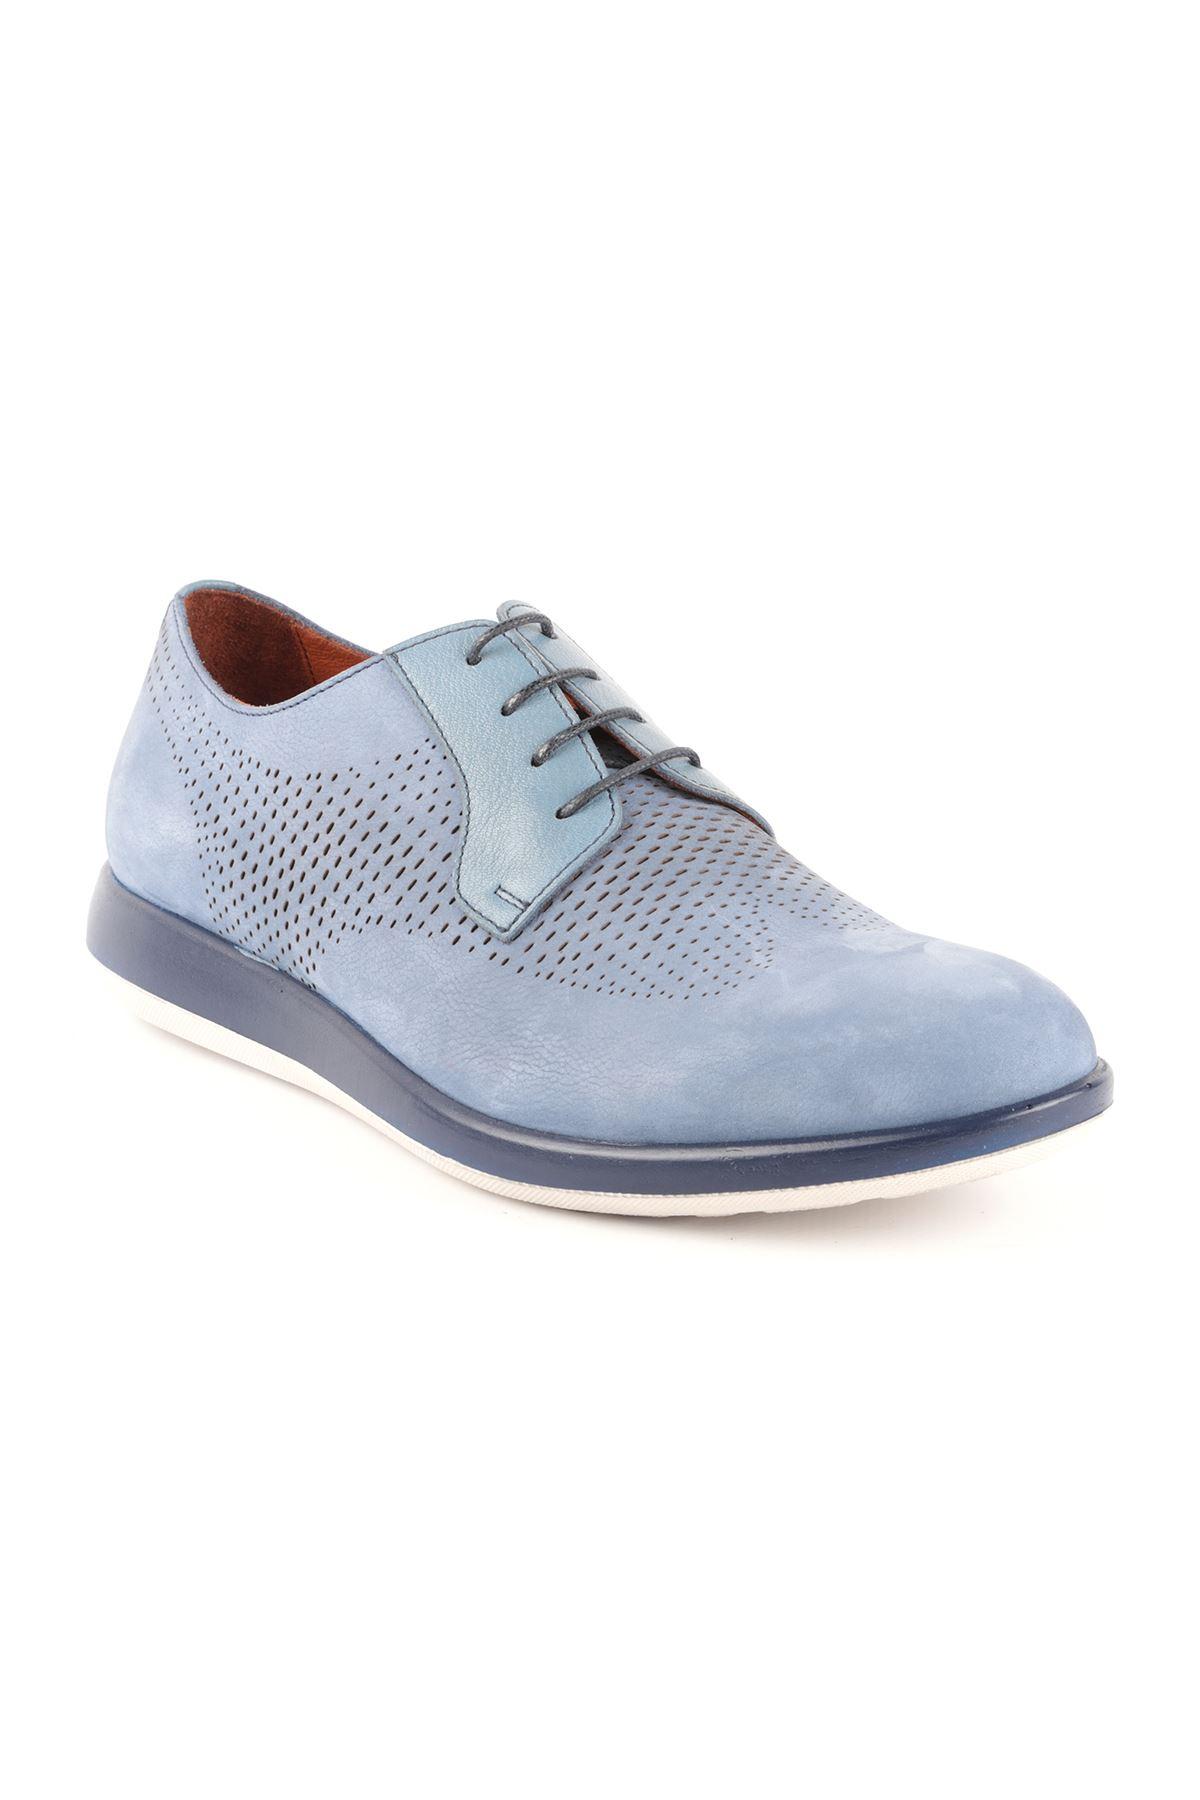 Libero T1413 Blue Casual Shoes